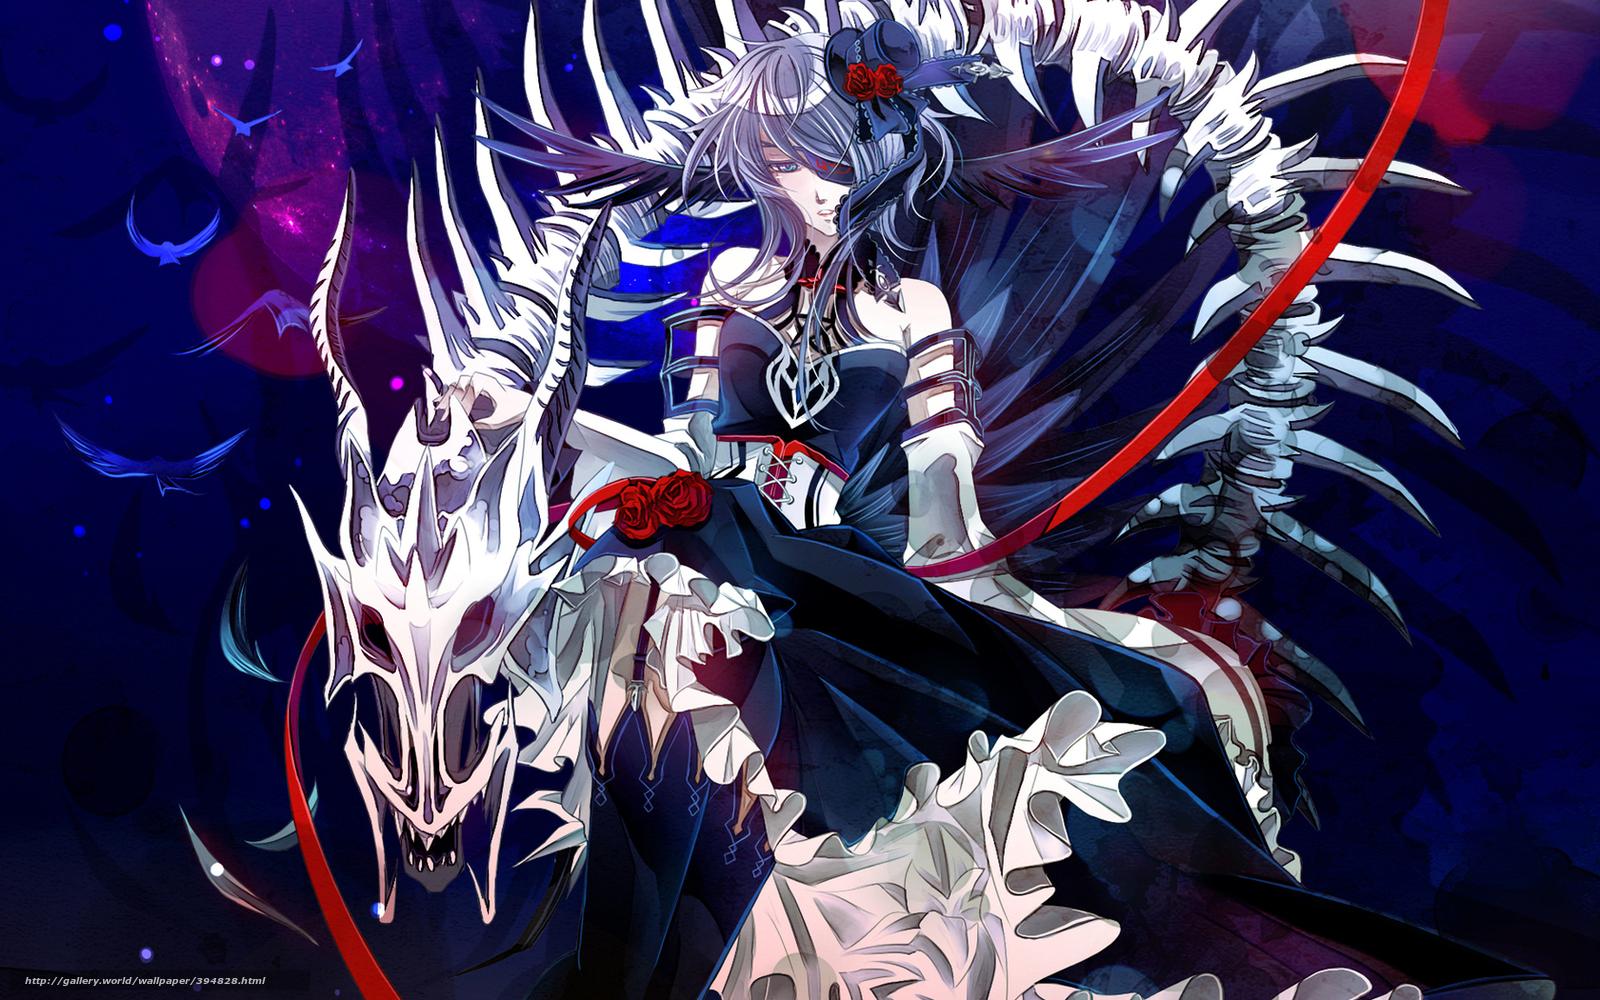 Download Wallpaper Girl Skeleton Rose Stockings Anime Girl With A Bone Dragon 1600x1000 Wallpaper Teahub Io